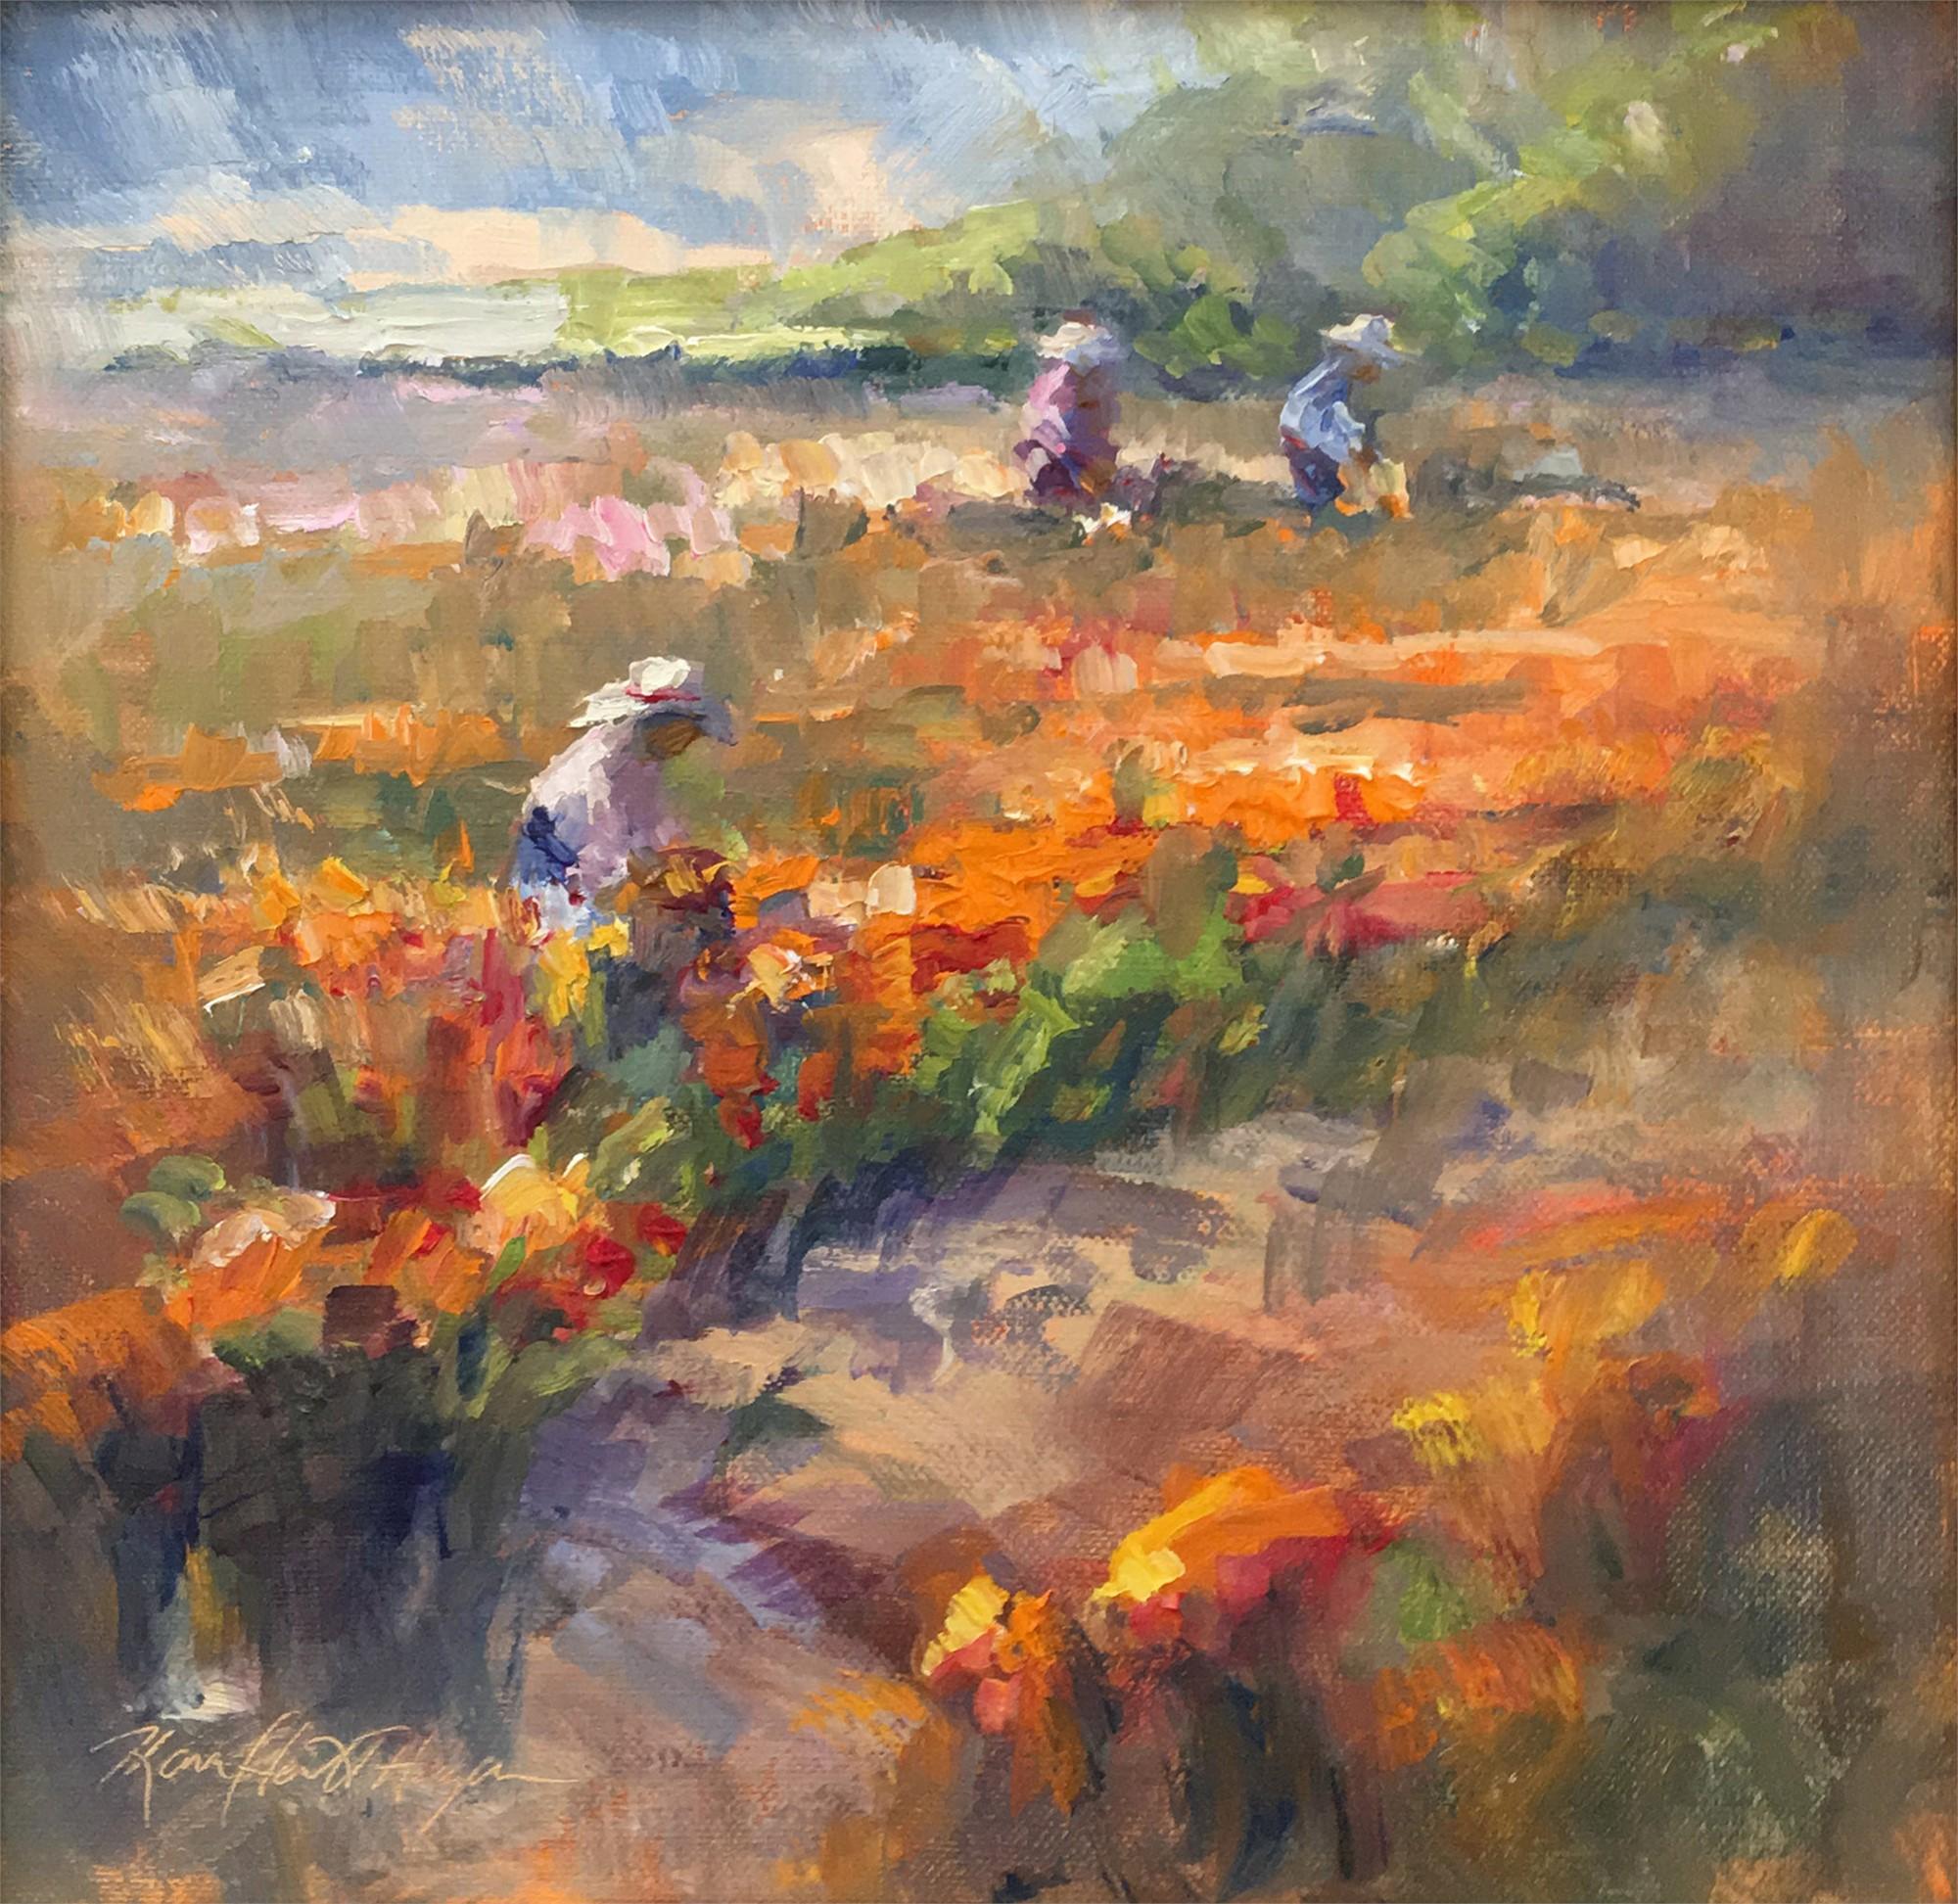 Flower Pickers (California) by Karen Hewitt Hagan